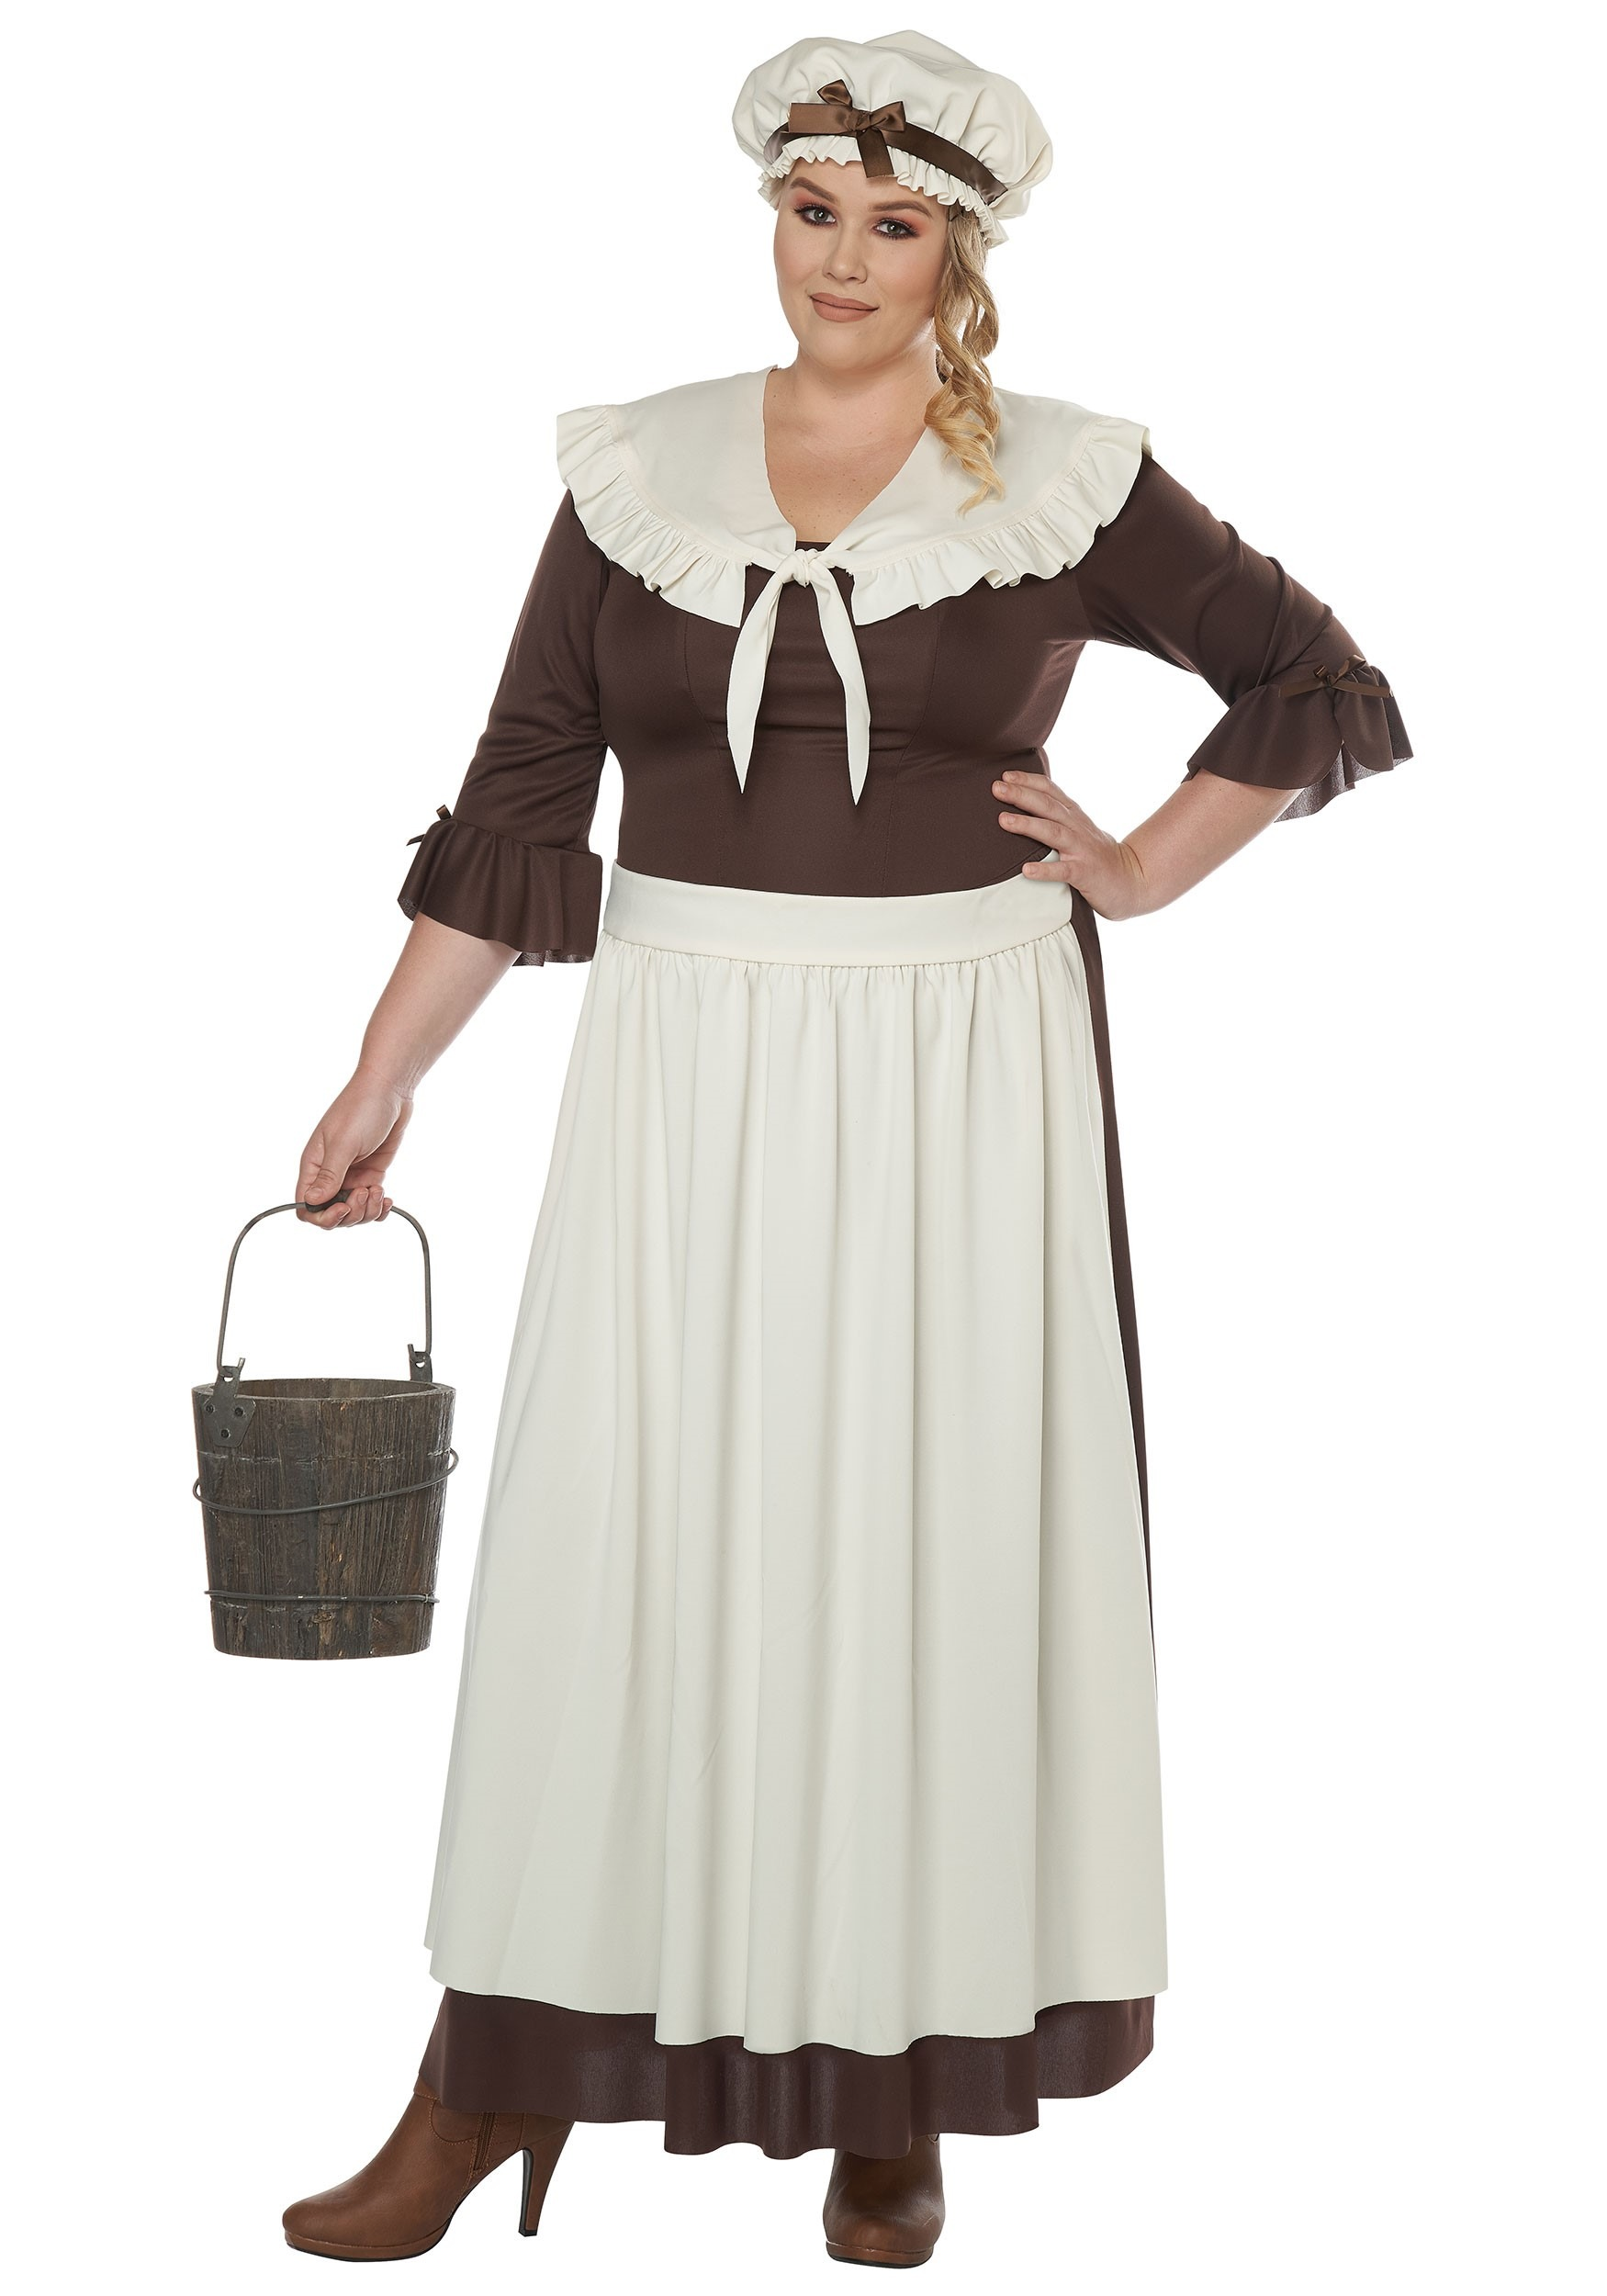 Plus Size Colonial Village Woman Costume